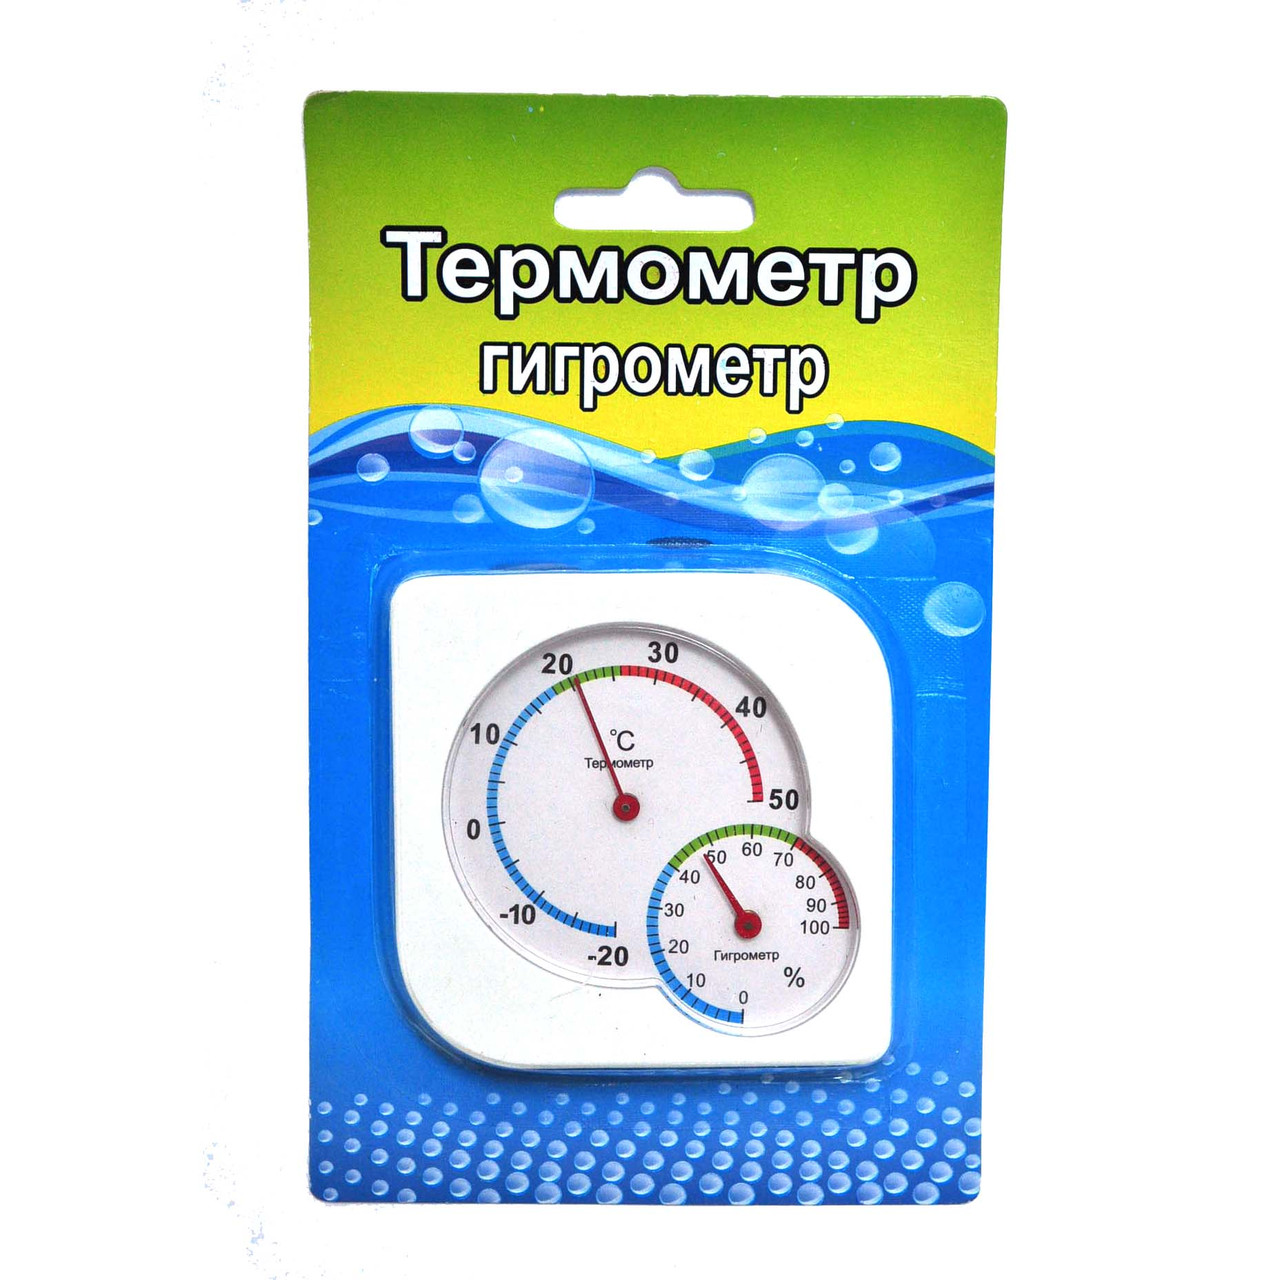 Термометр Гигрометр Артикул ТГ-2